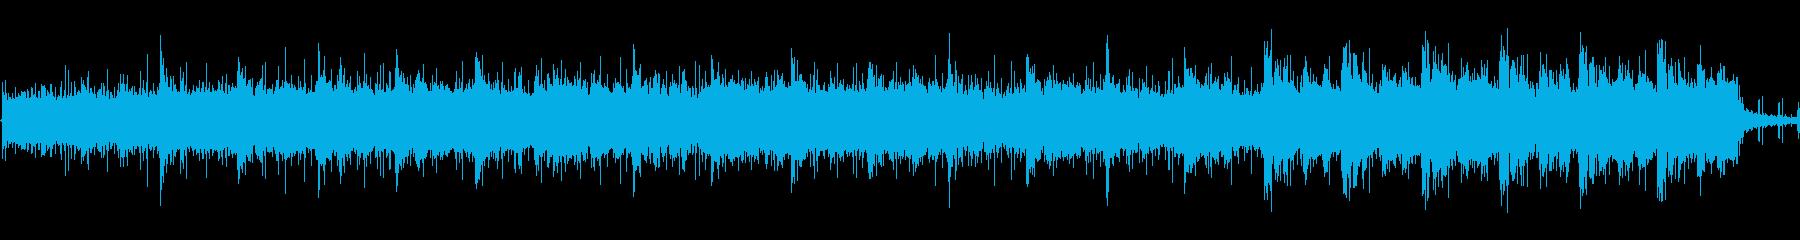 orbitalの再生済みの波形